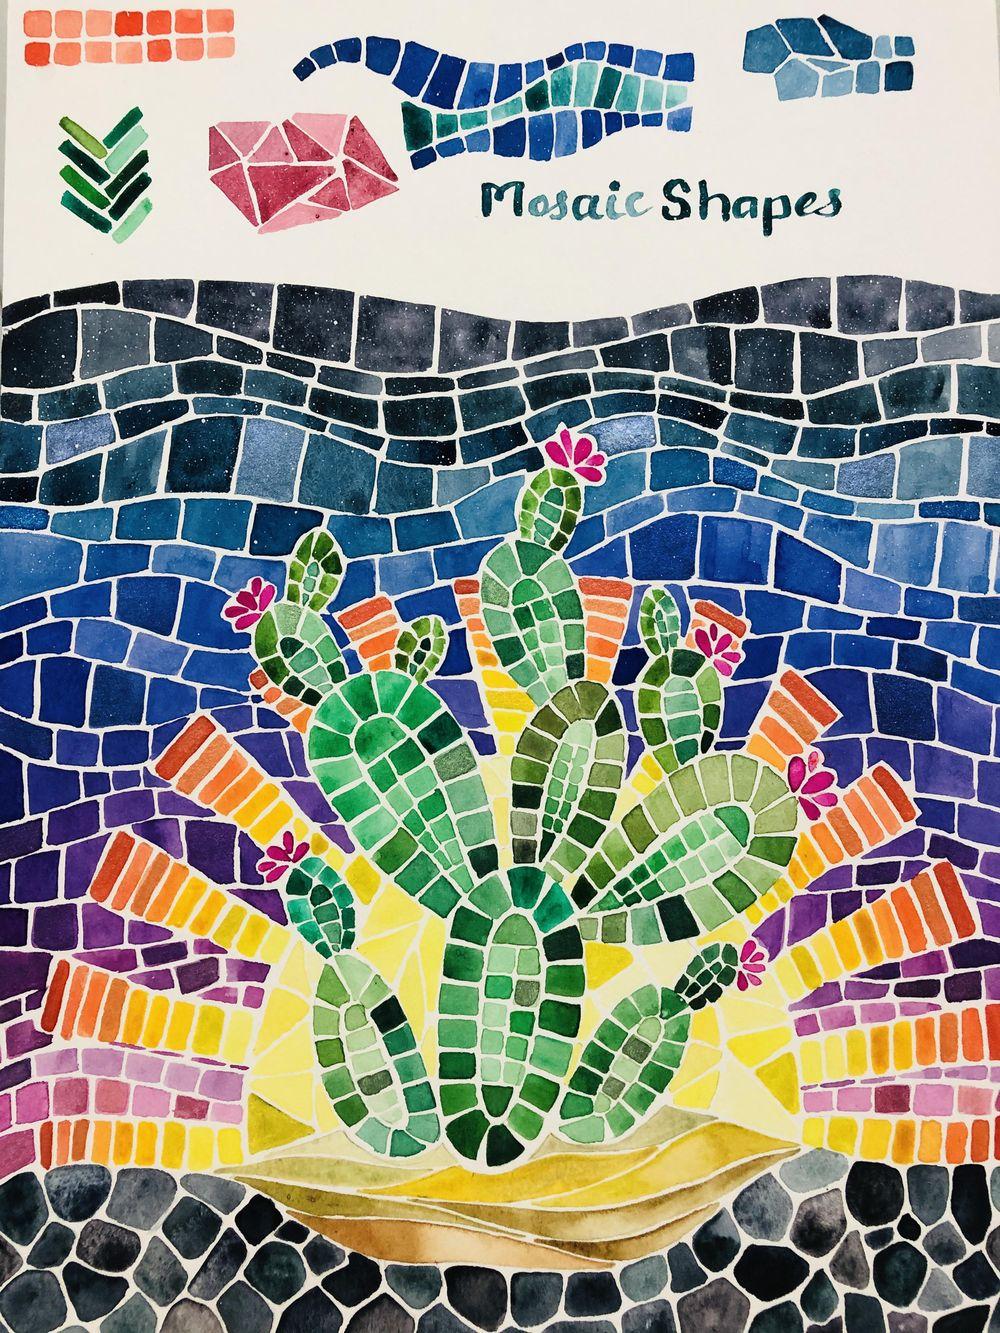 Desert Cacti Horizon Watercolor Mosaic process and final piece - image 4 - student project